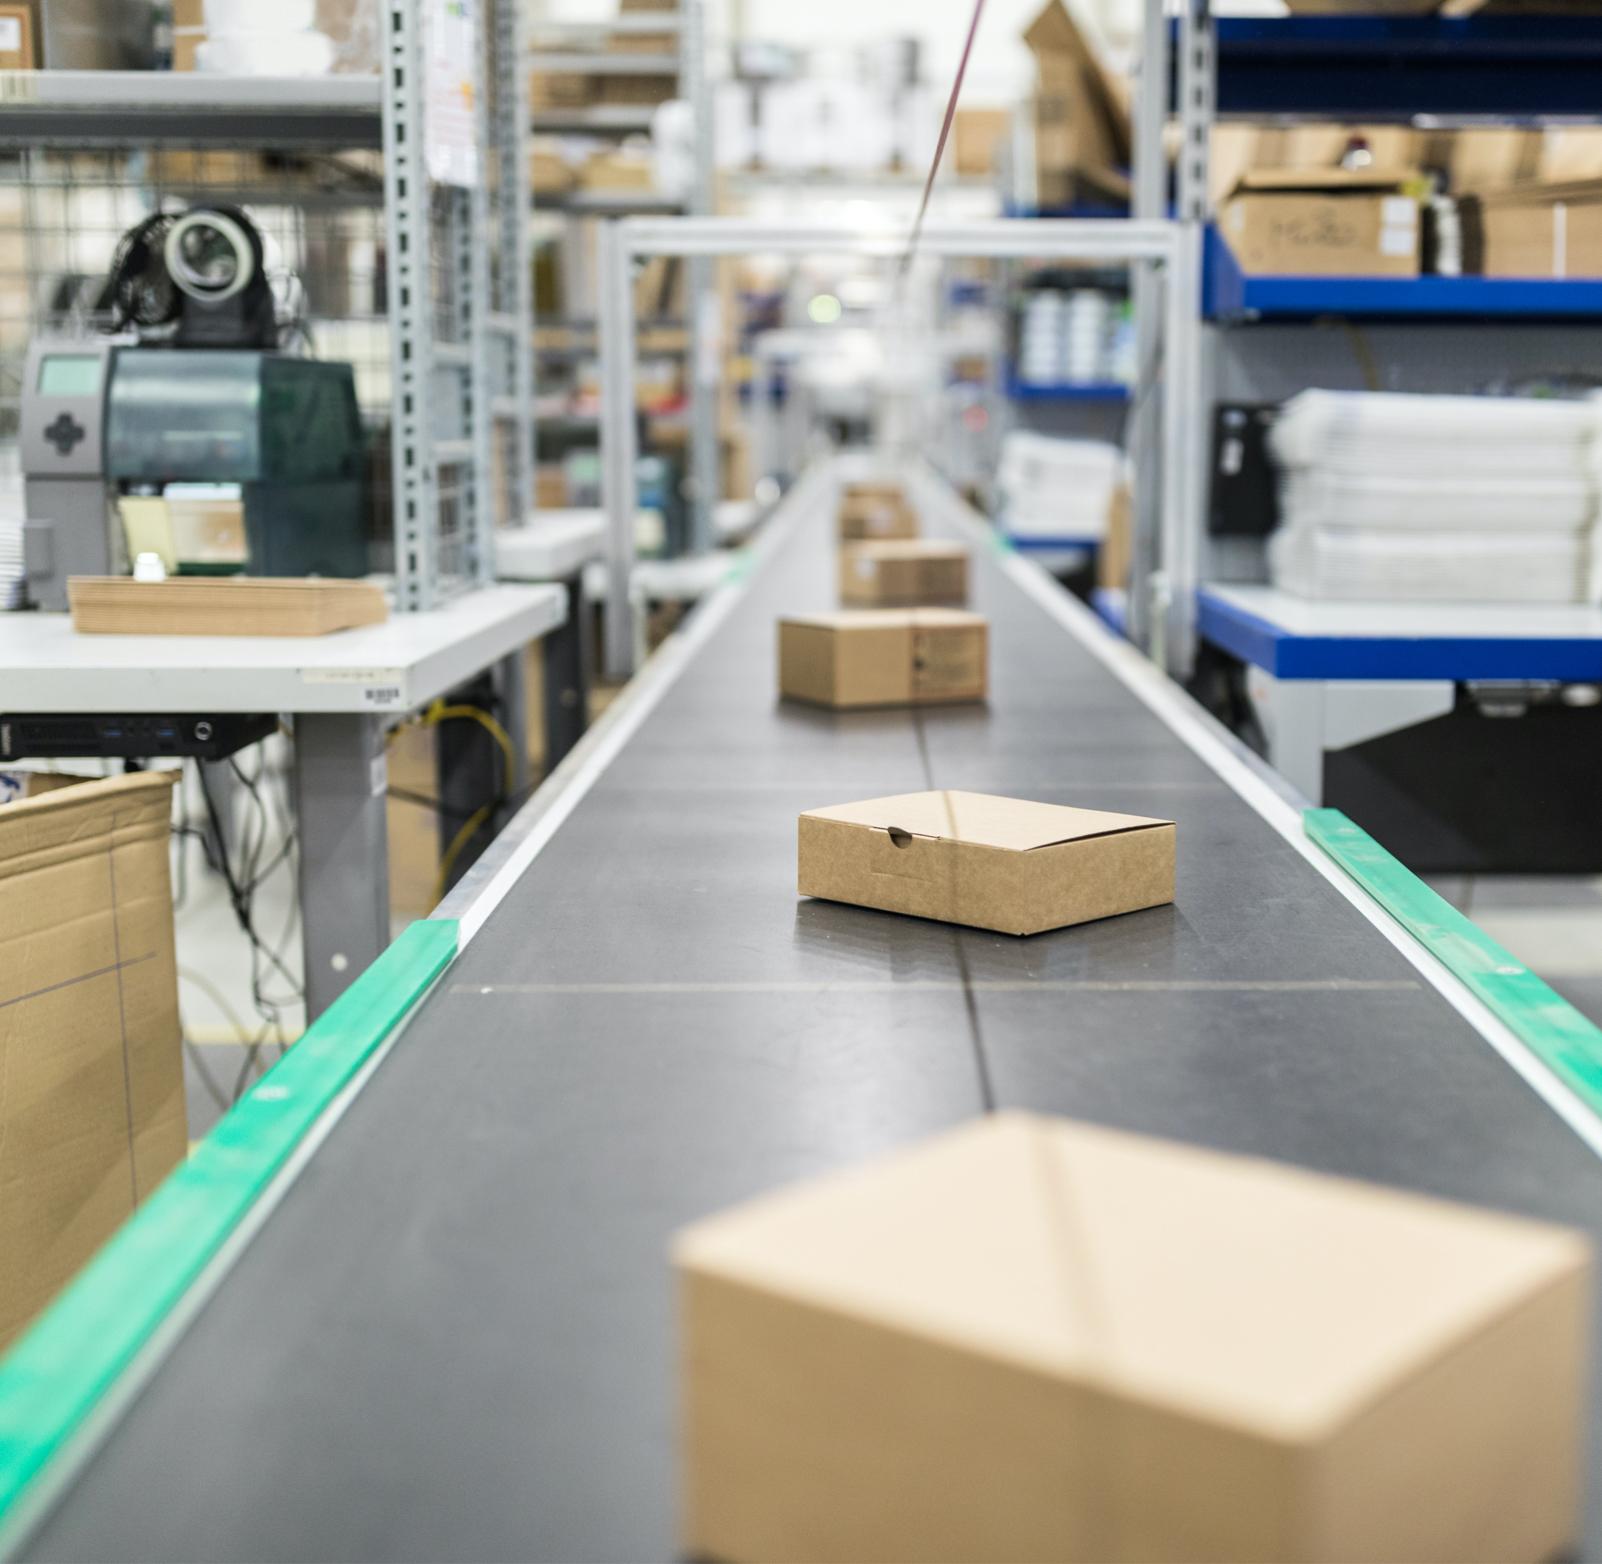 Photo of boxes on conveyor belt